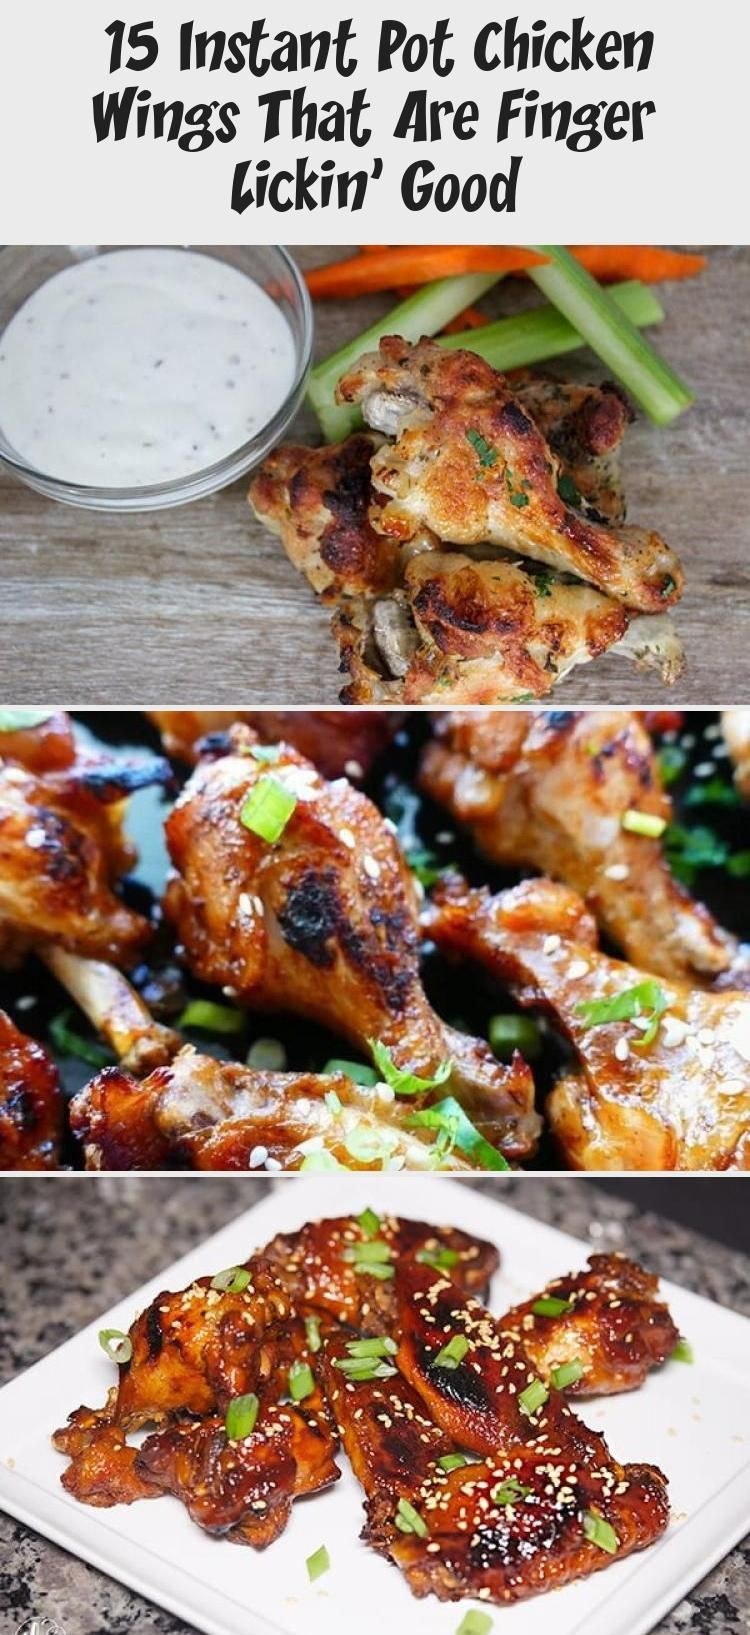 instant pot chicken wings | #bbqchicken #fingerlickinggood #buffalochicken #chickenwings #wings #InstantPotRecipesIndian #InstantPotRecipesSkinnytaste #InstantPotRecipesMeatballs #CheapInstantPotRecipes #InstantPotRecipesPhillyCheesesteak #instant pot recipes wings